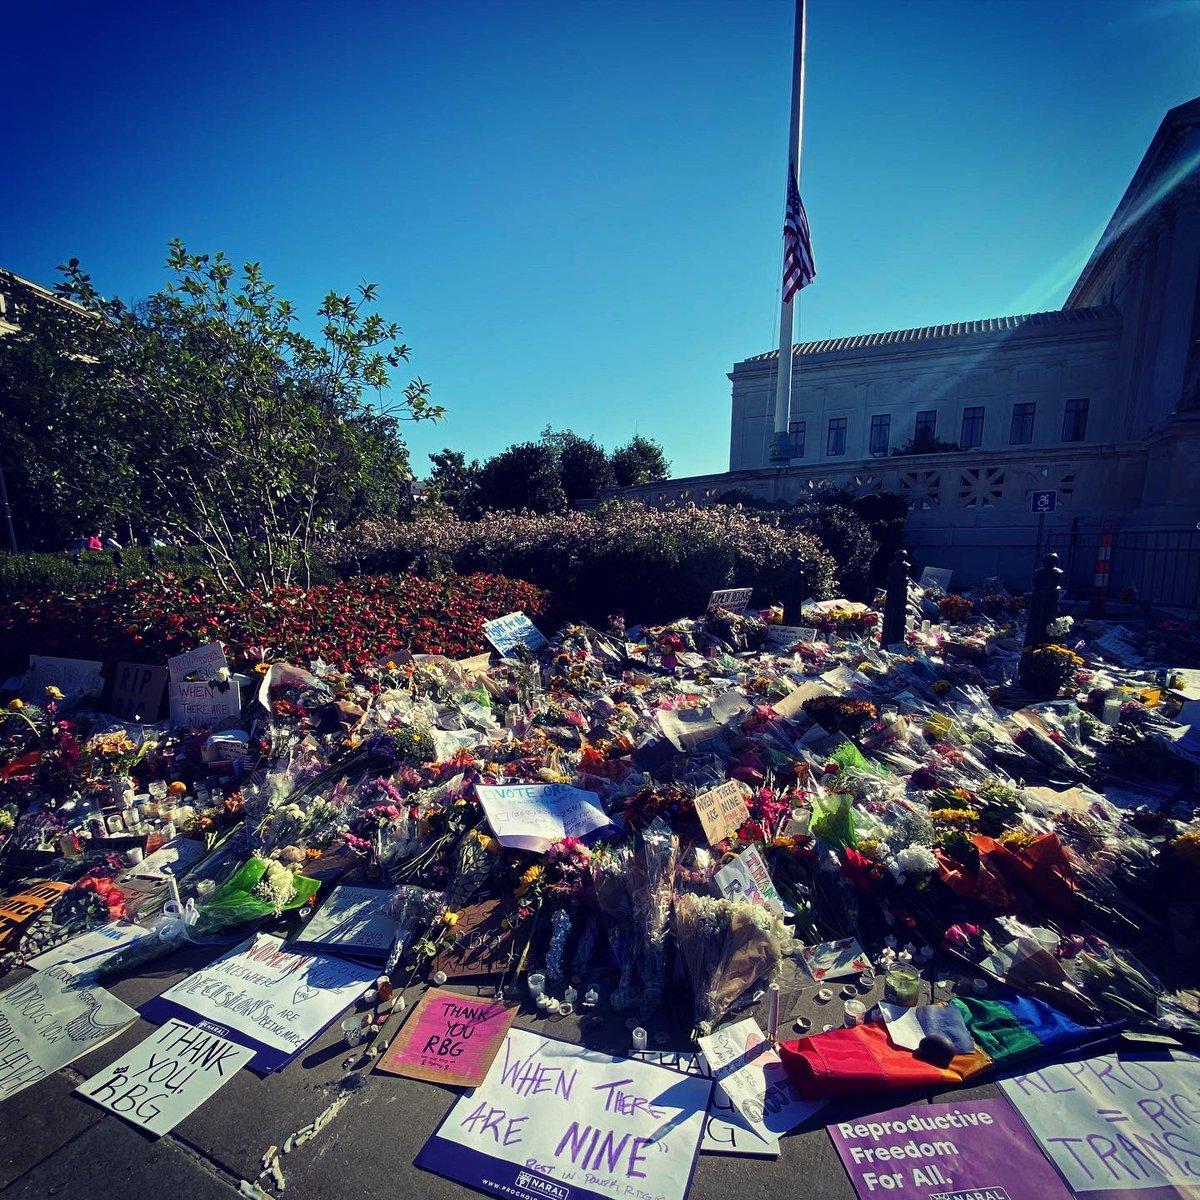 Sunday morning at the US Supreme Court https://t.co/ExotbPxORt